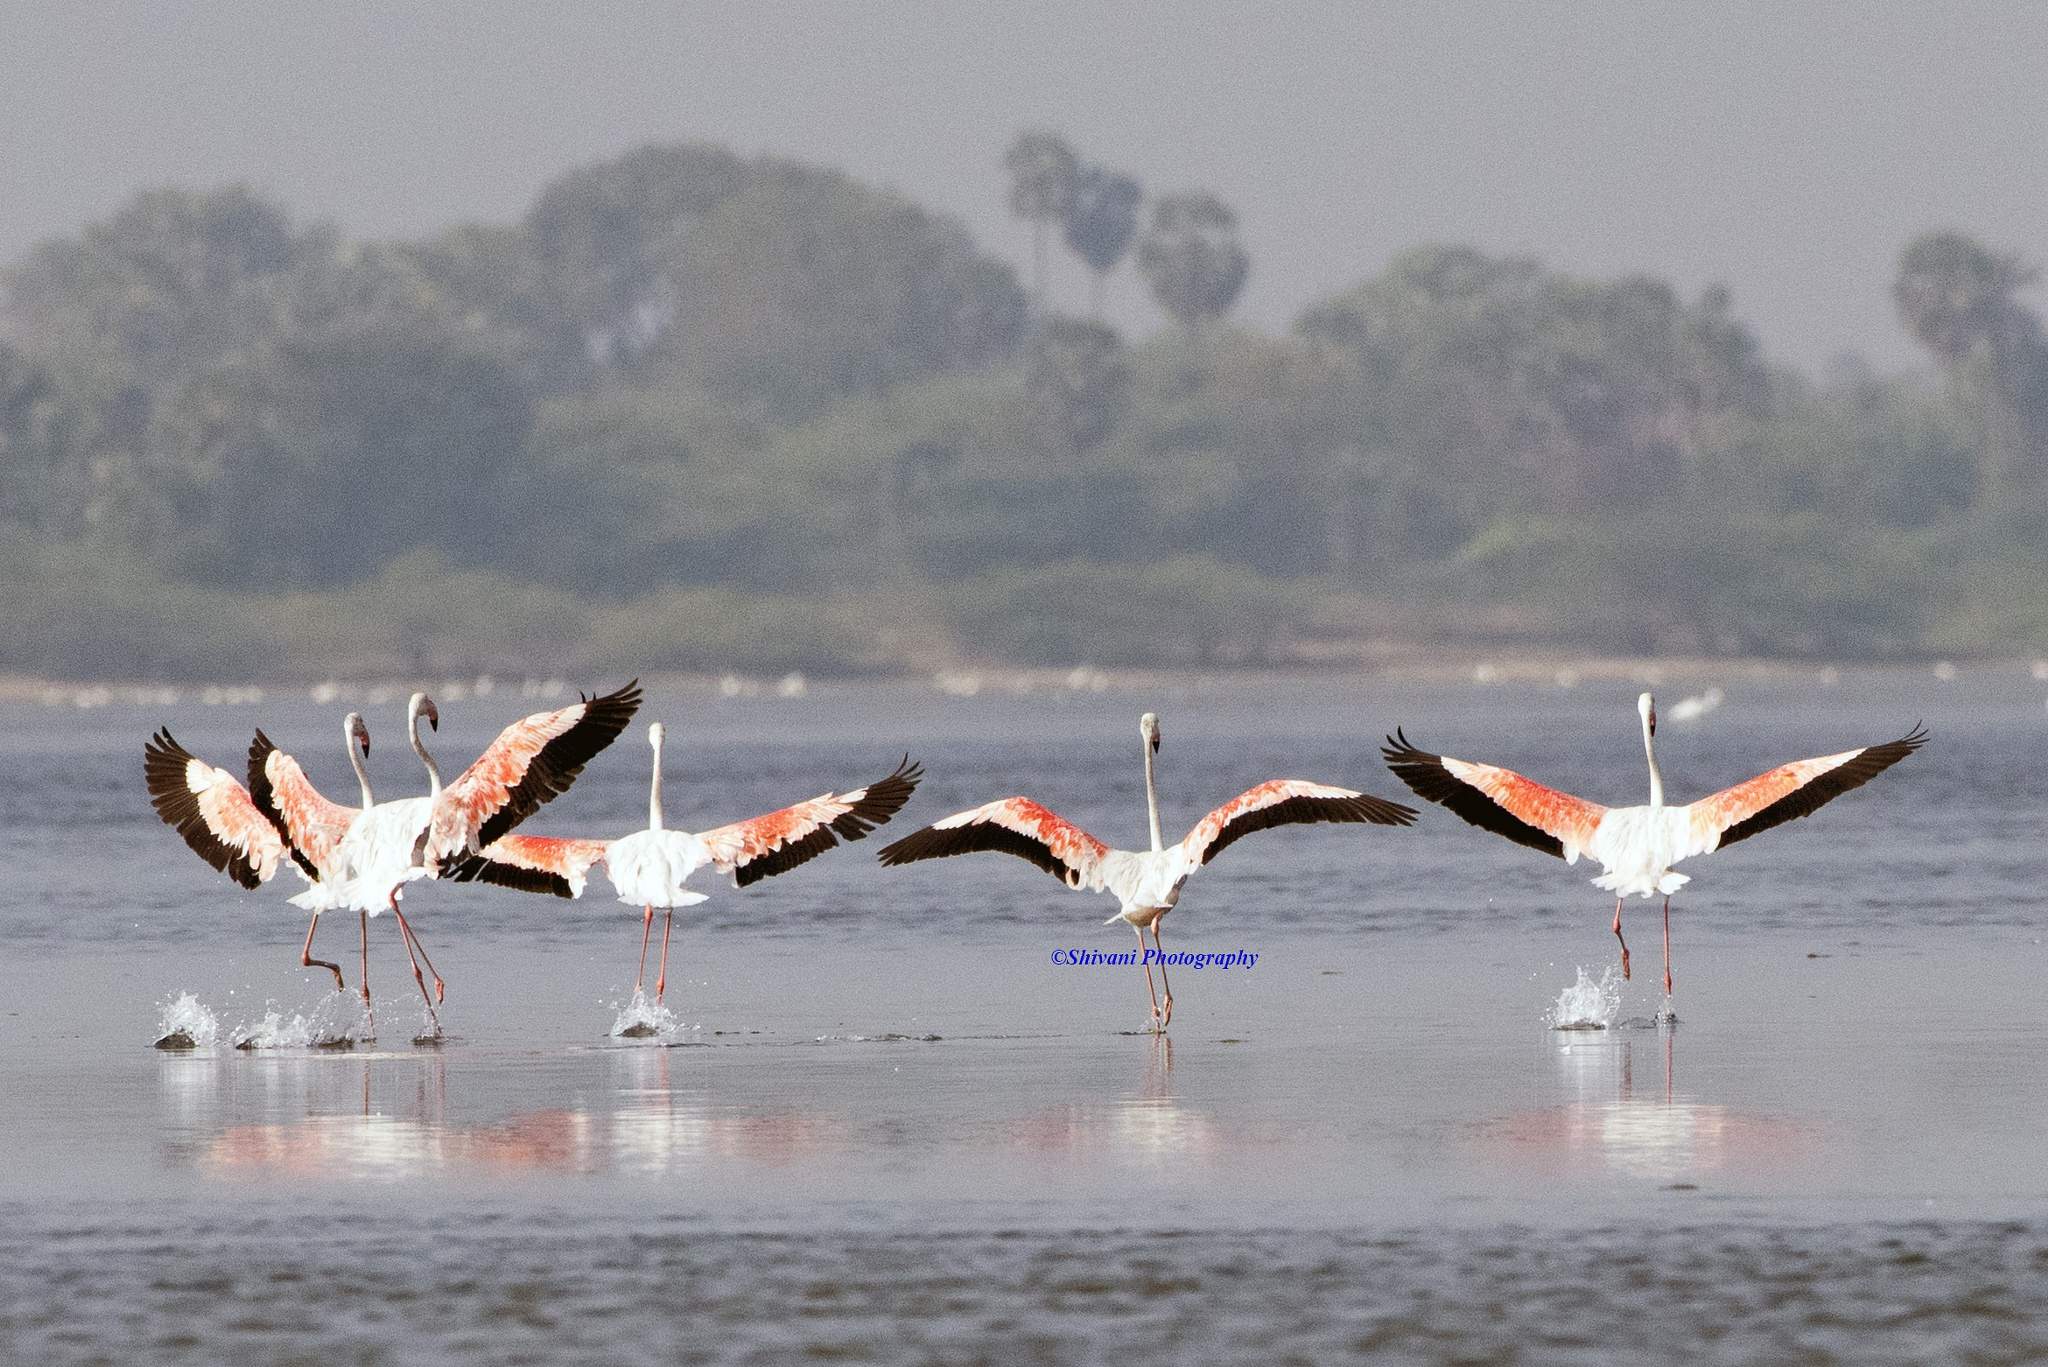 Spread your wings by Srinivasan Krishnamurthi